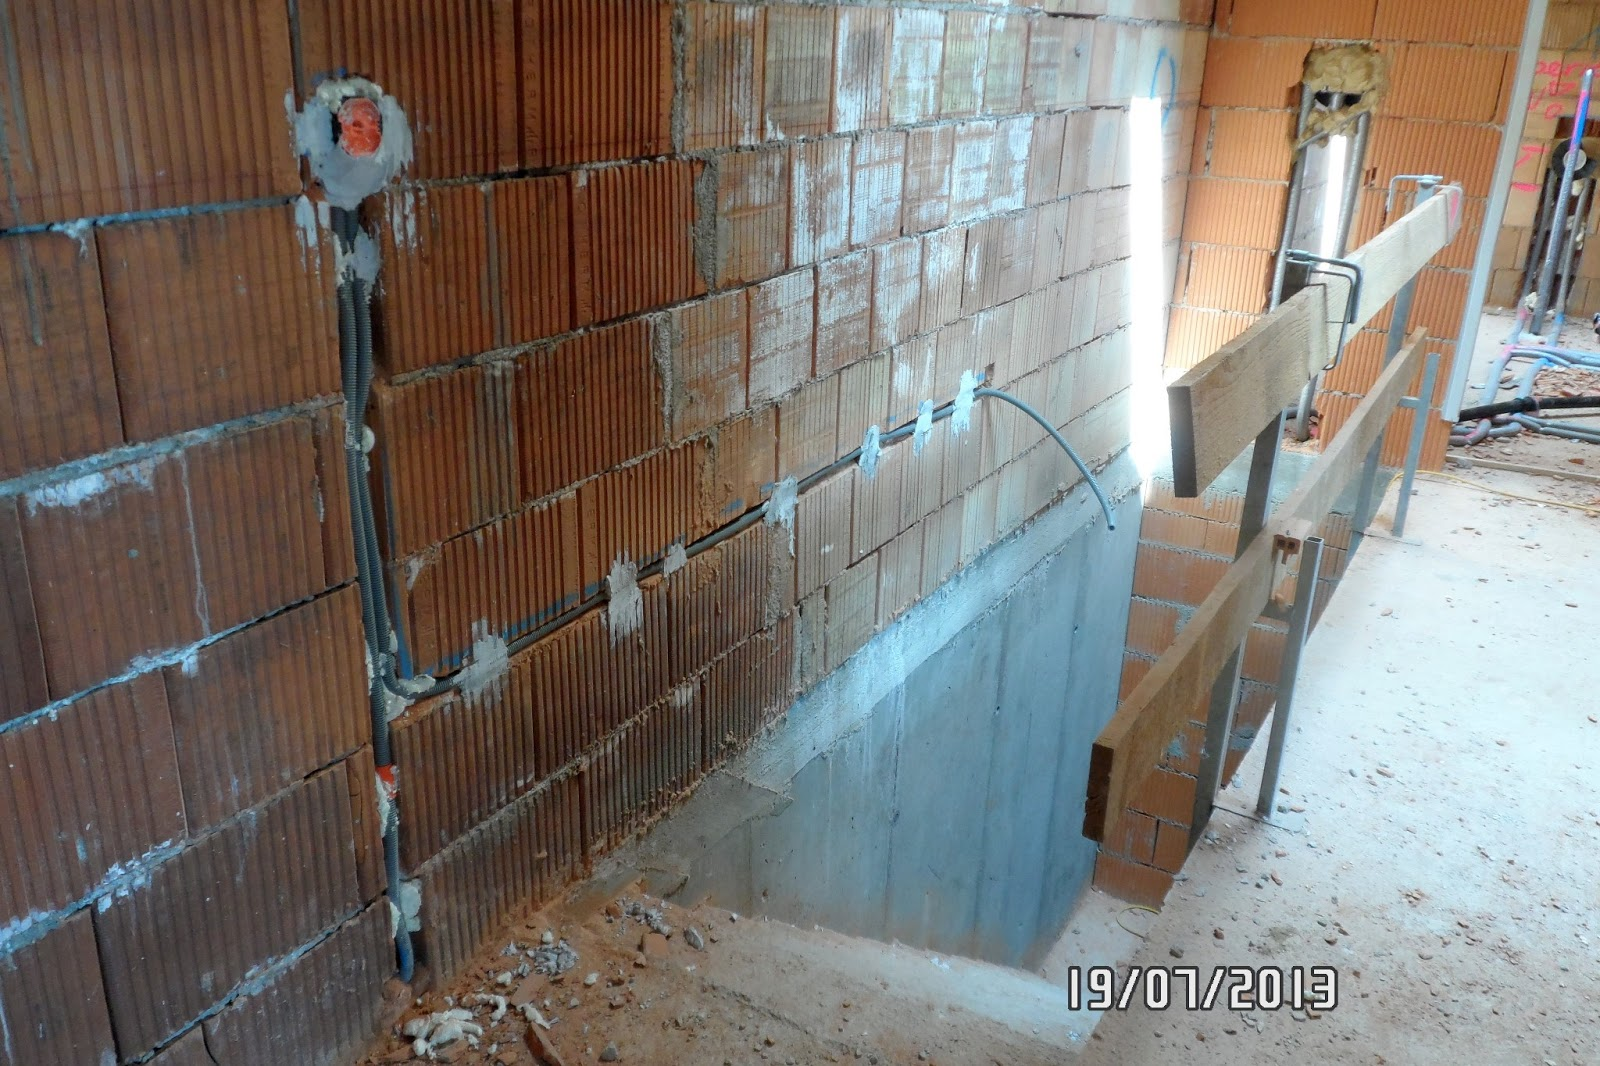 Keller neu verputzen 1920 keller halb unter der erde putz verputzen keller opferputz - Kellerwand abdichten altbau ...